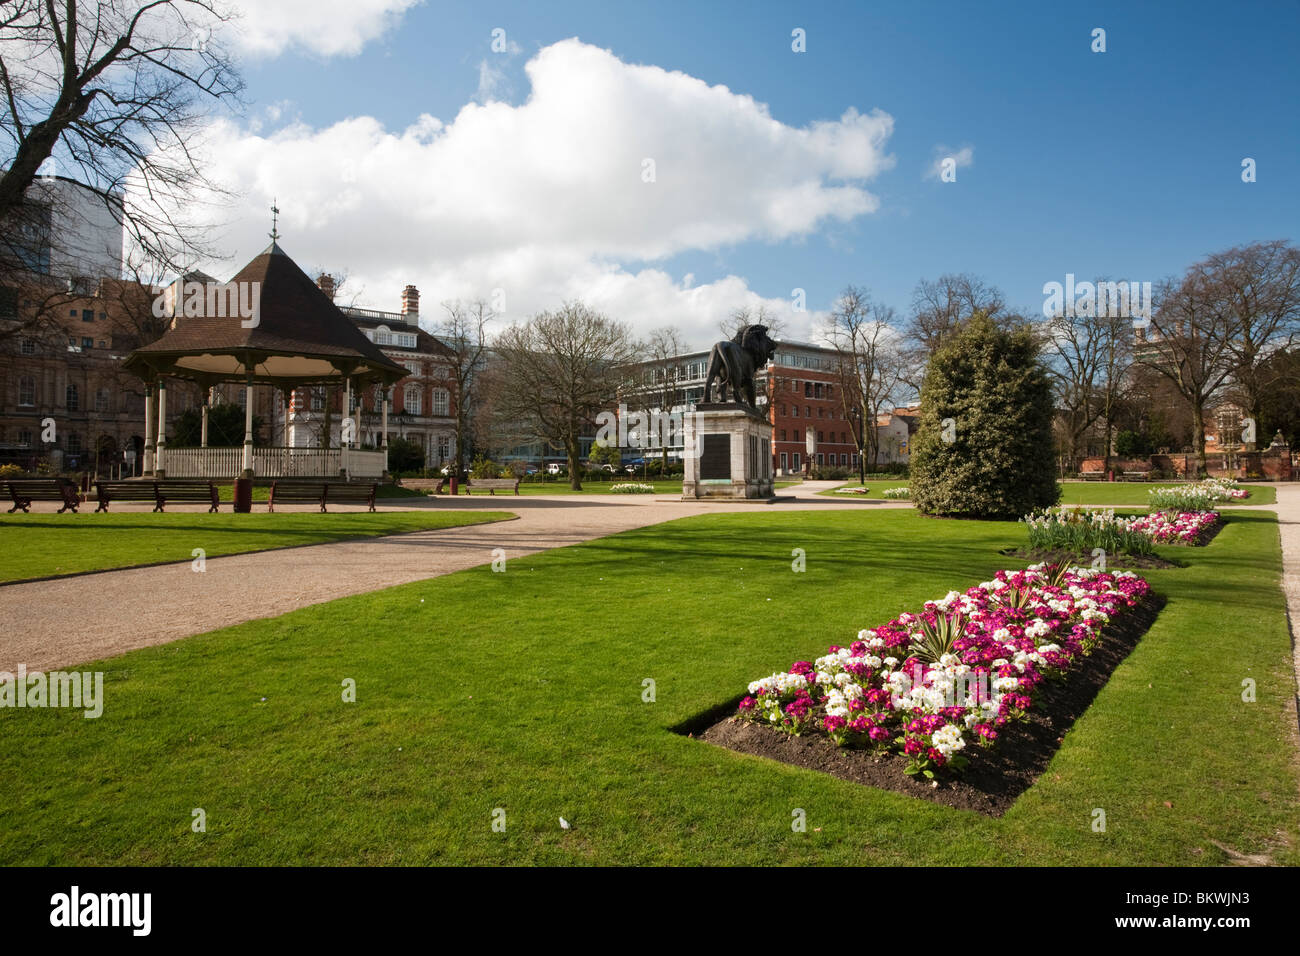 Spring in Forbury Gardens in Reading town centre, Berkshire, Uk Stock Photo